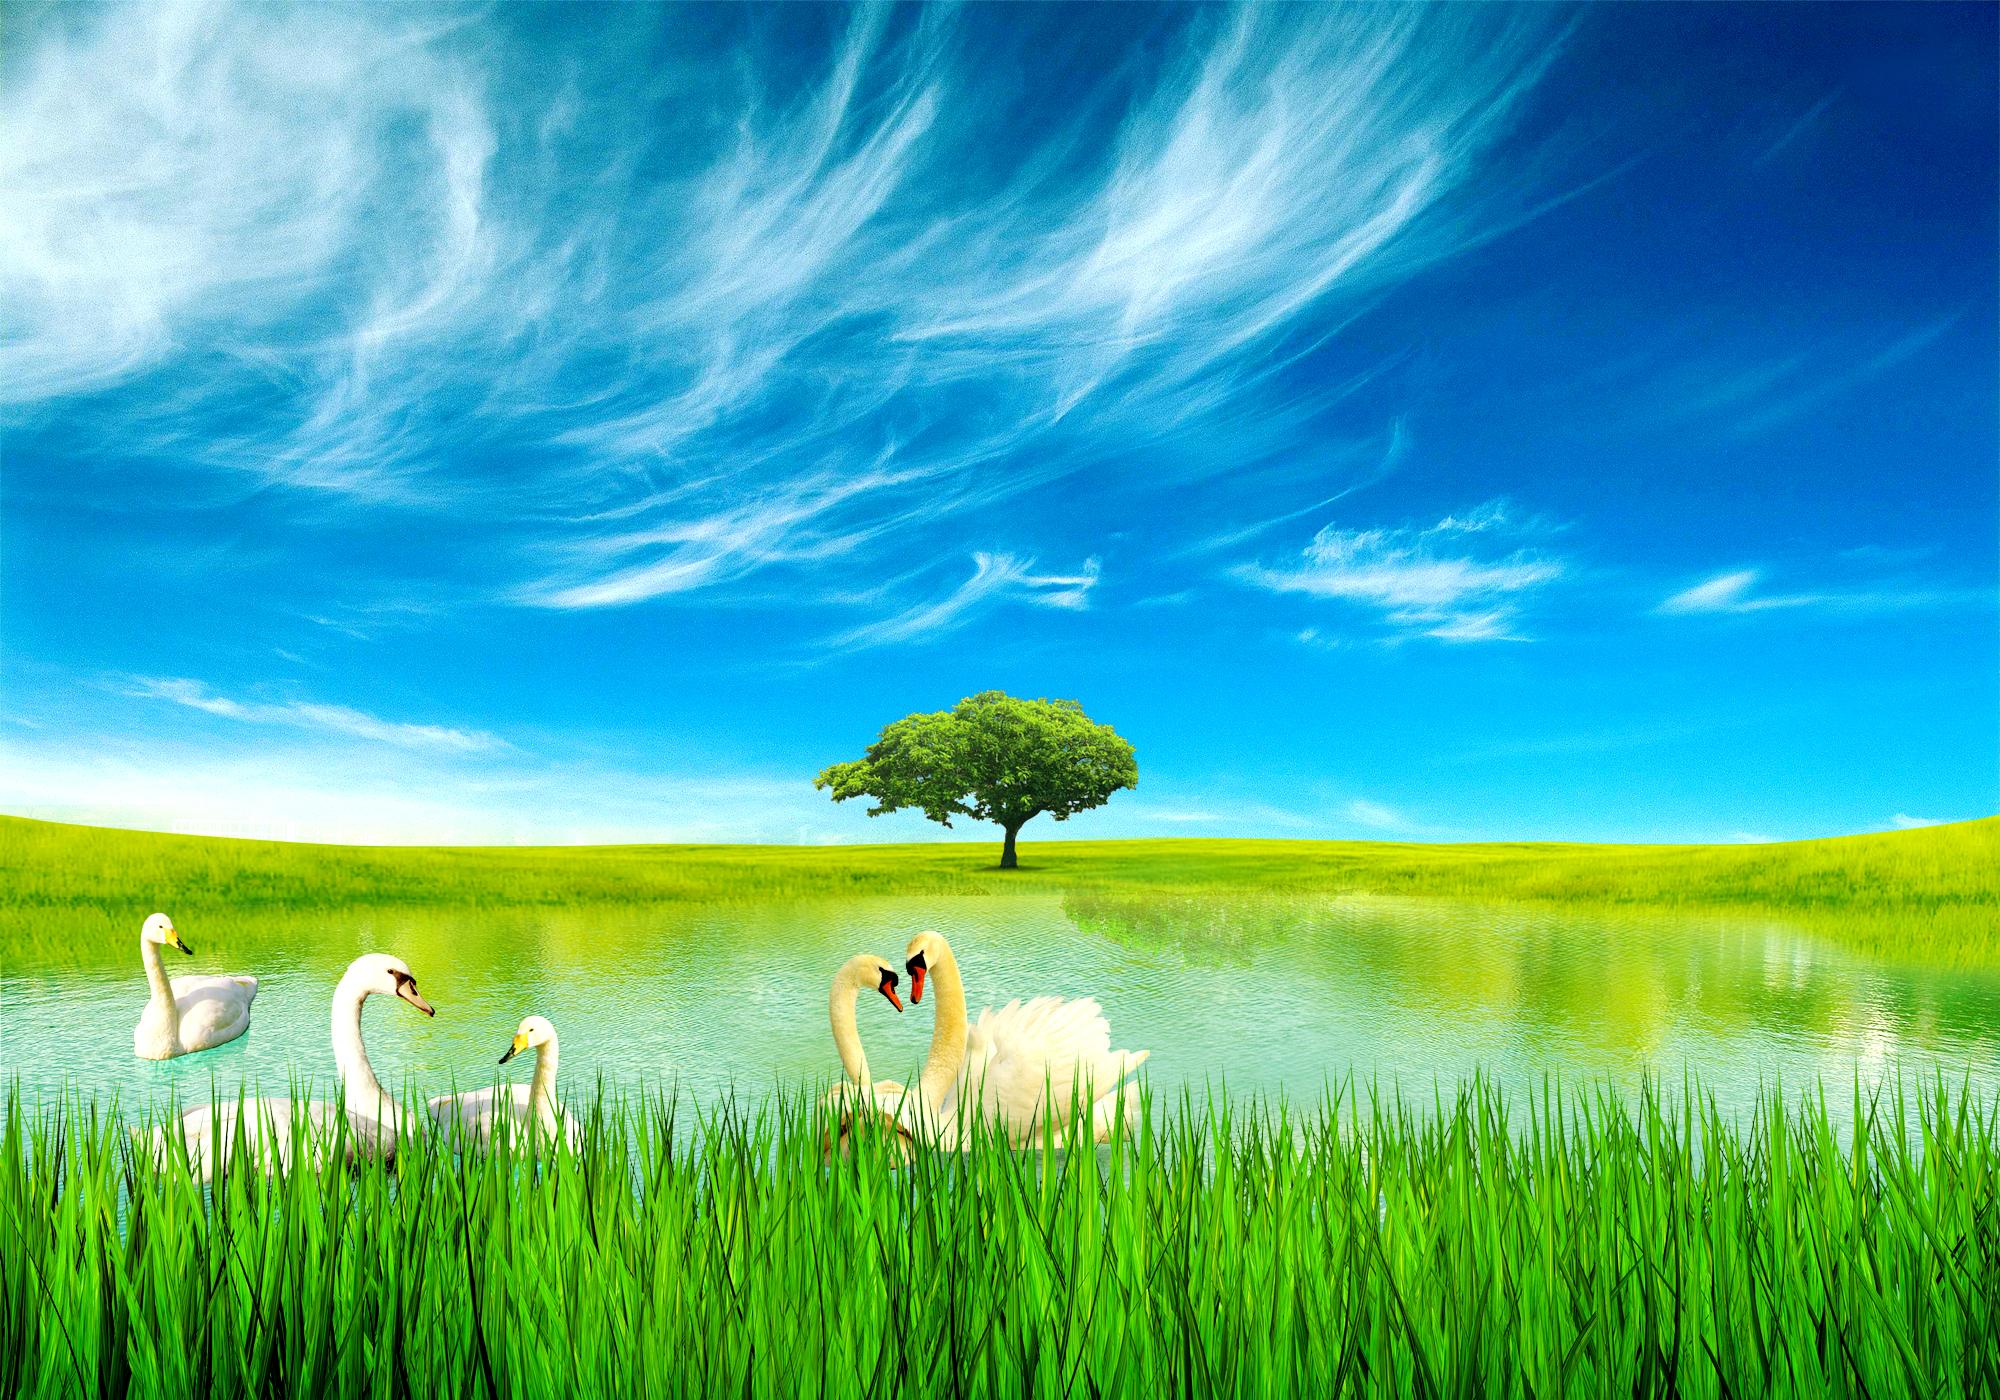 background photo nature